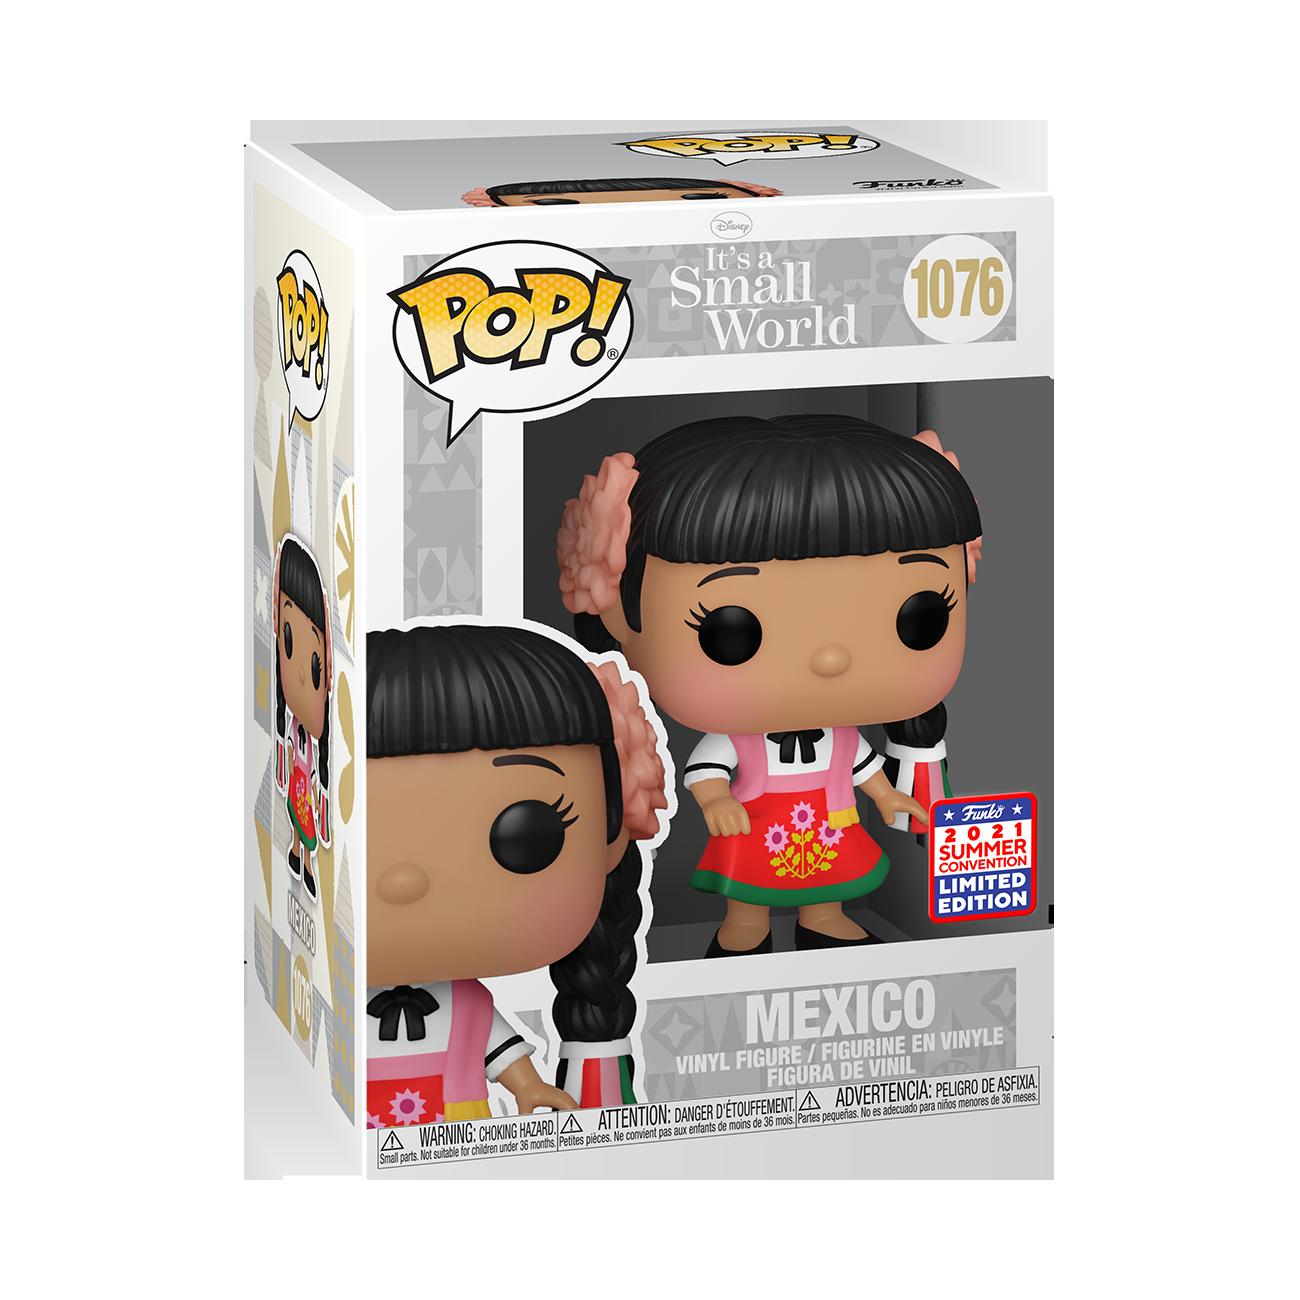 Disney - Small World Mexico Pop! Vinyl Figure